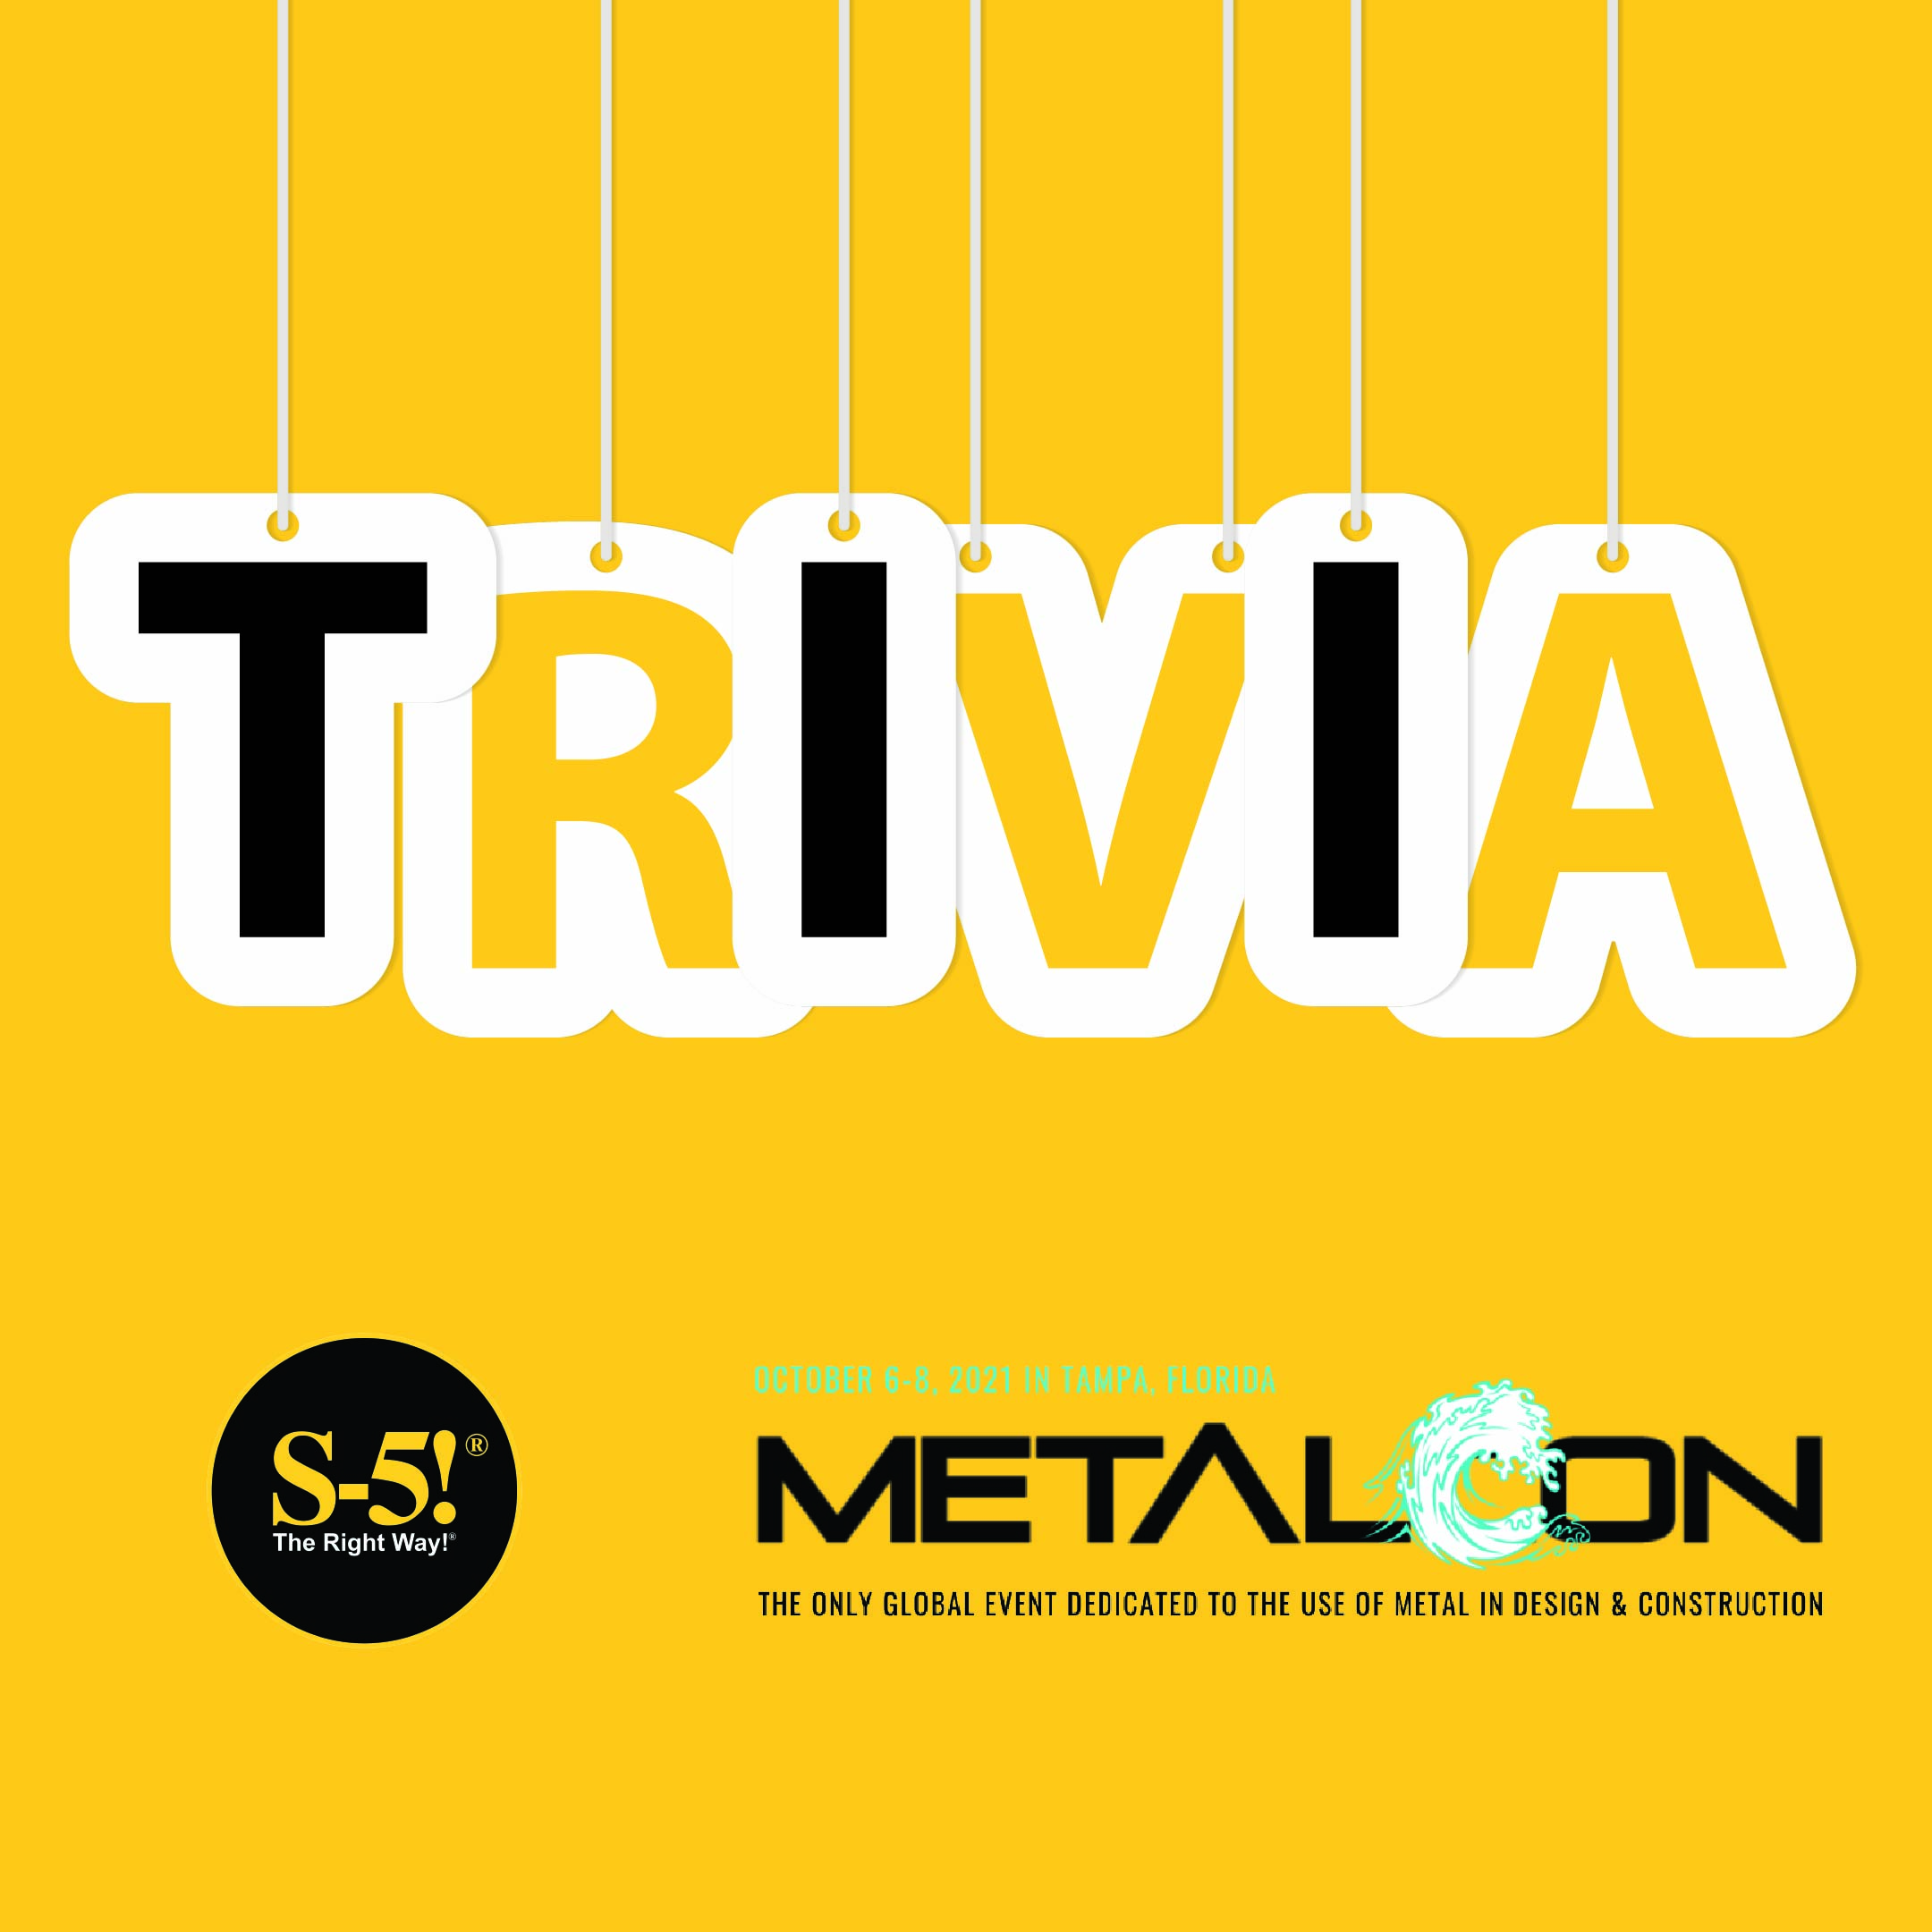 METALCON-Trivia-Instagram Image Size